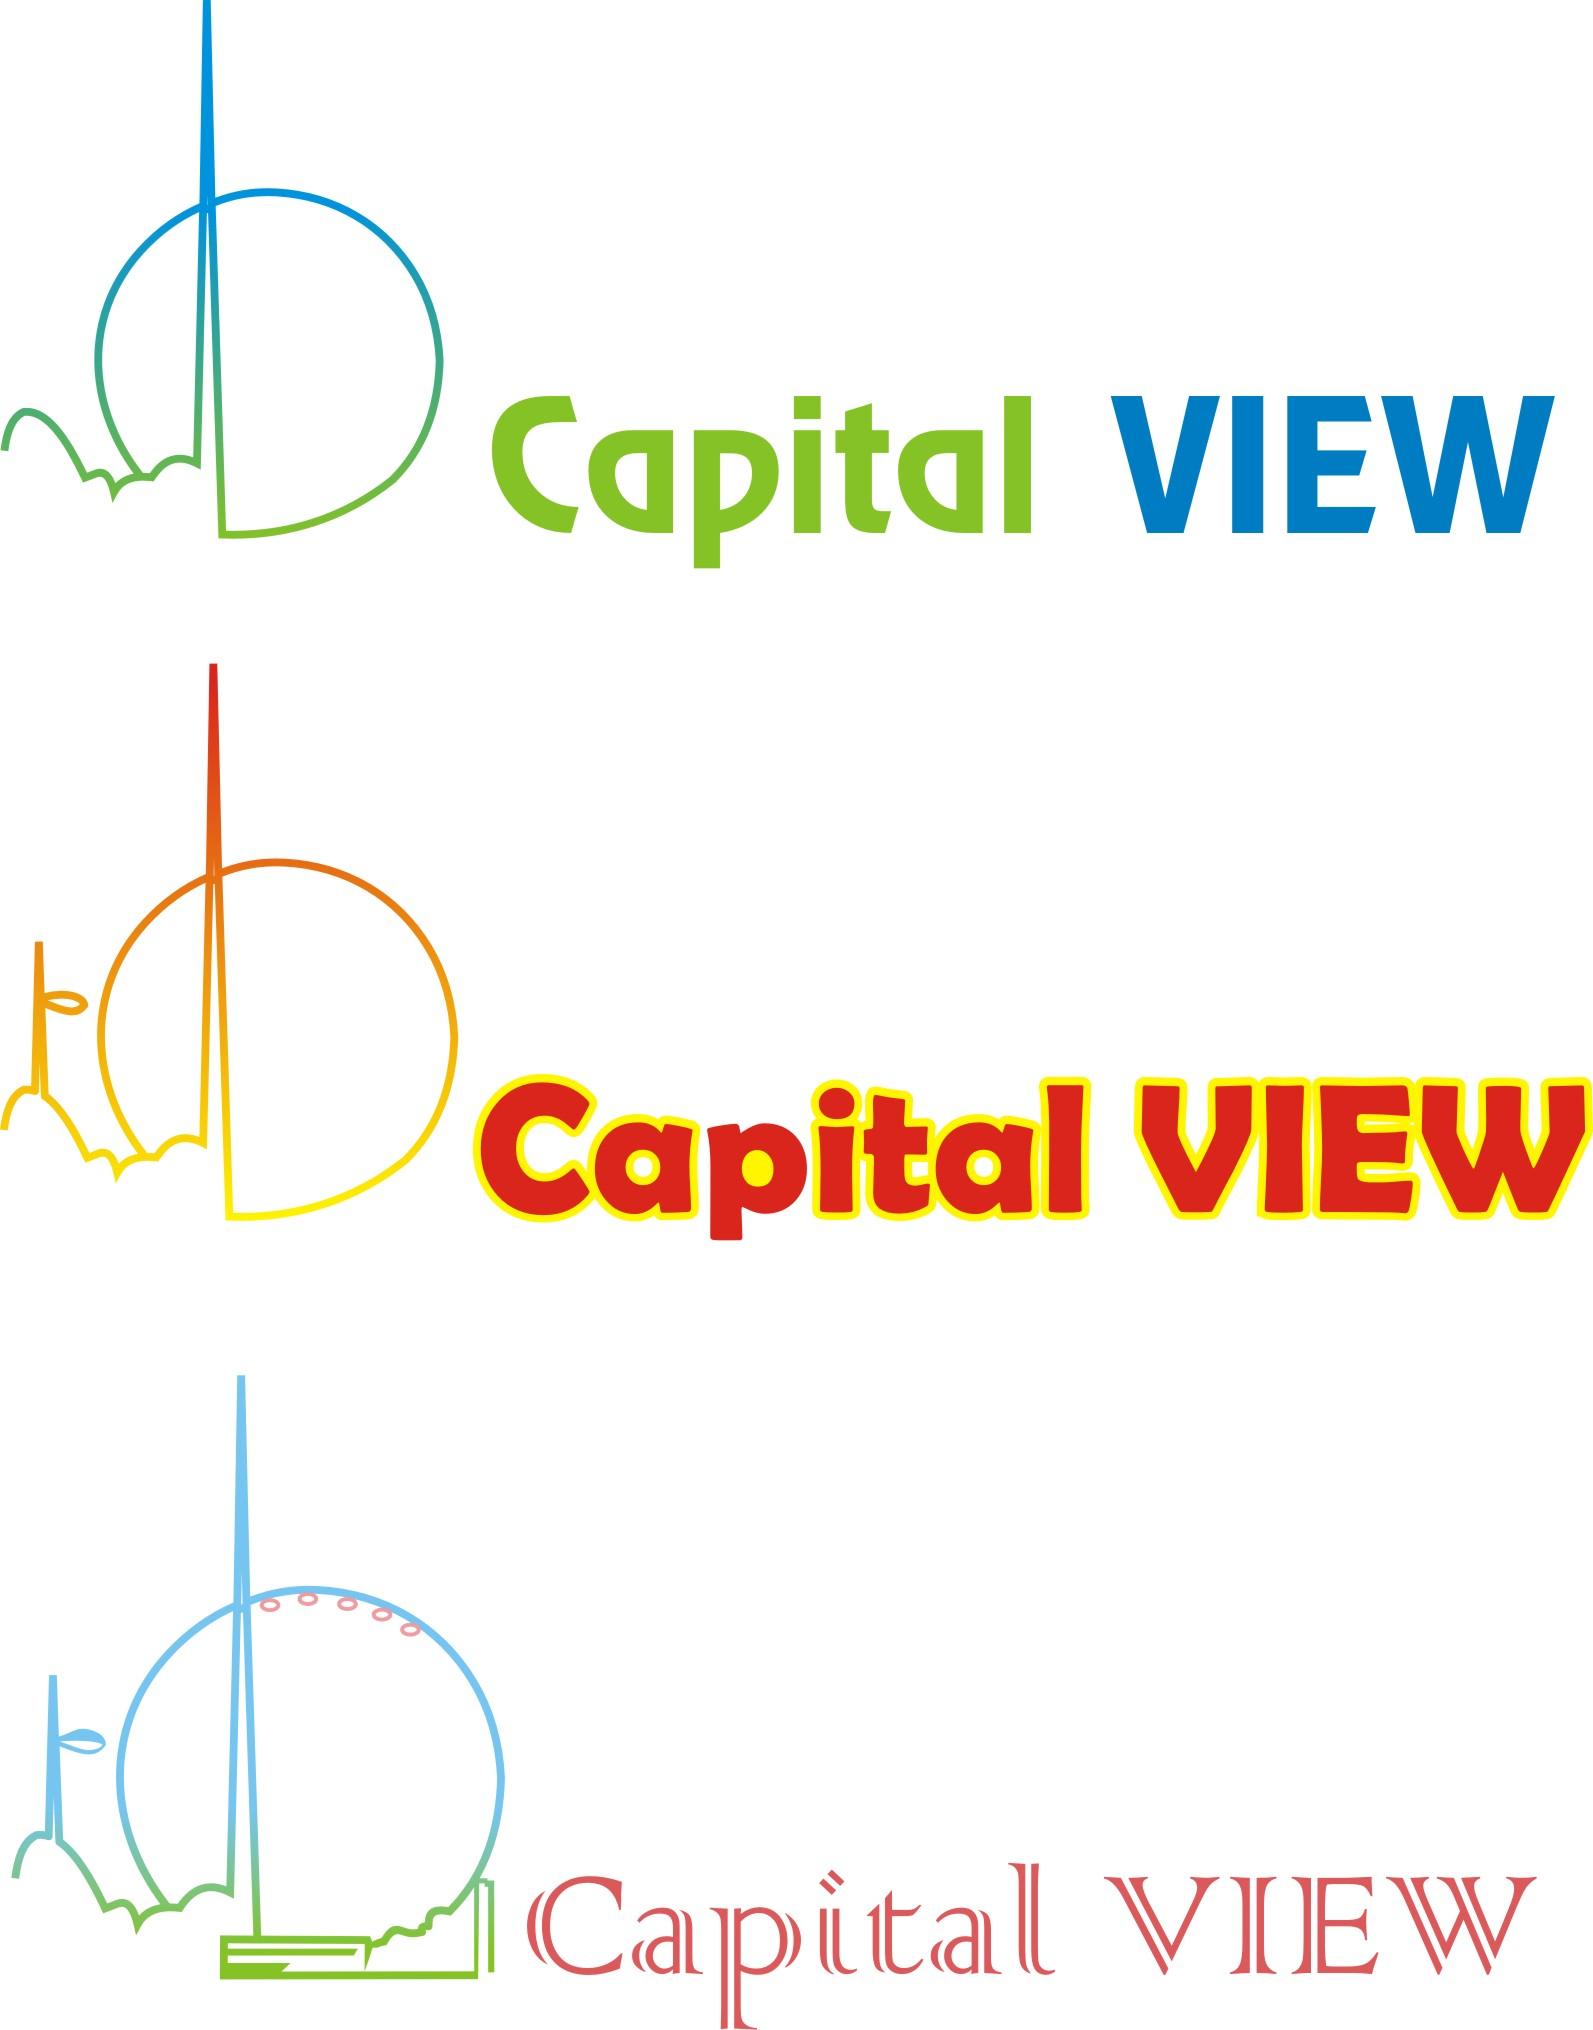 CAPITAL VIEW фото f_4fdc2255d5be3.jpg